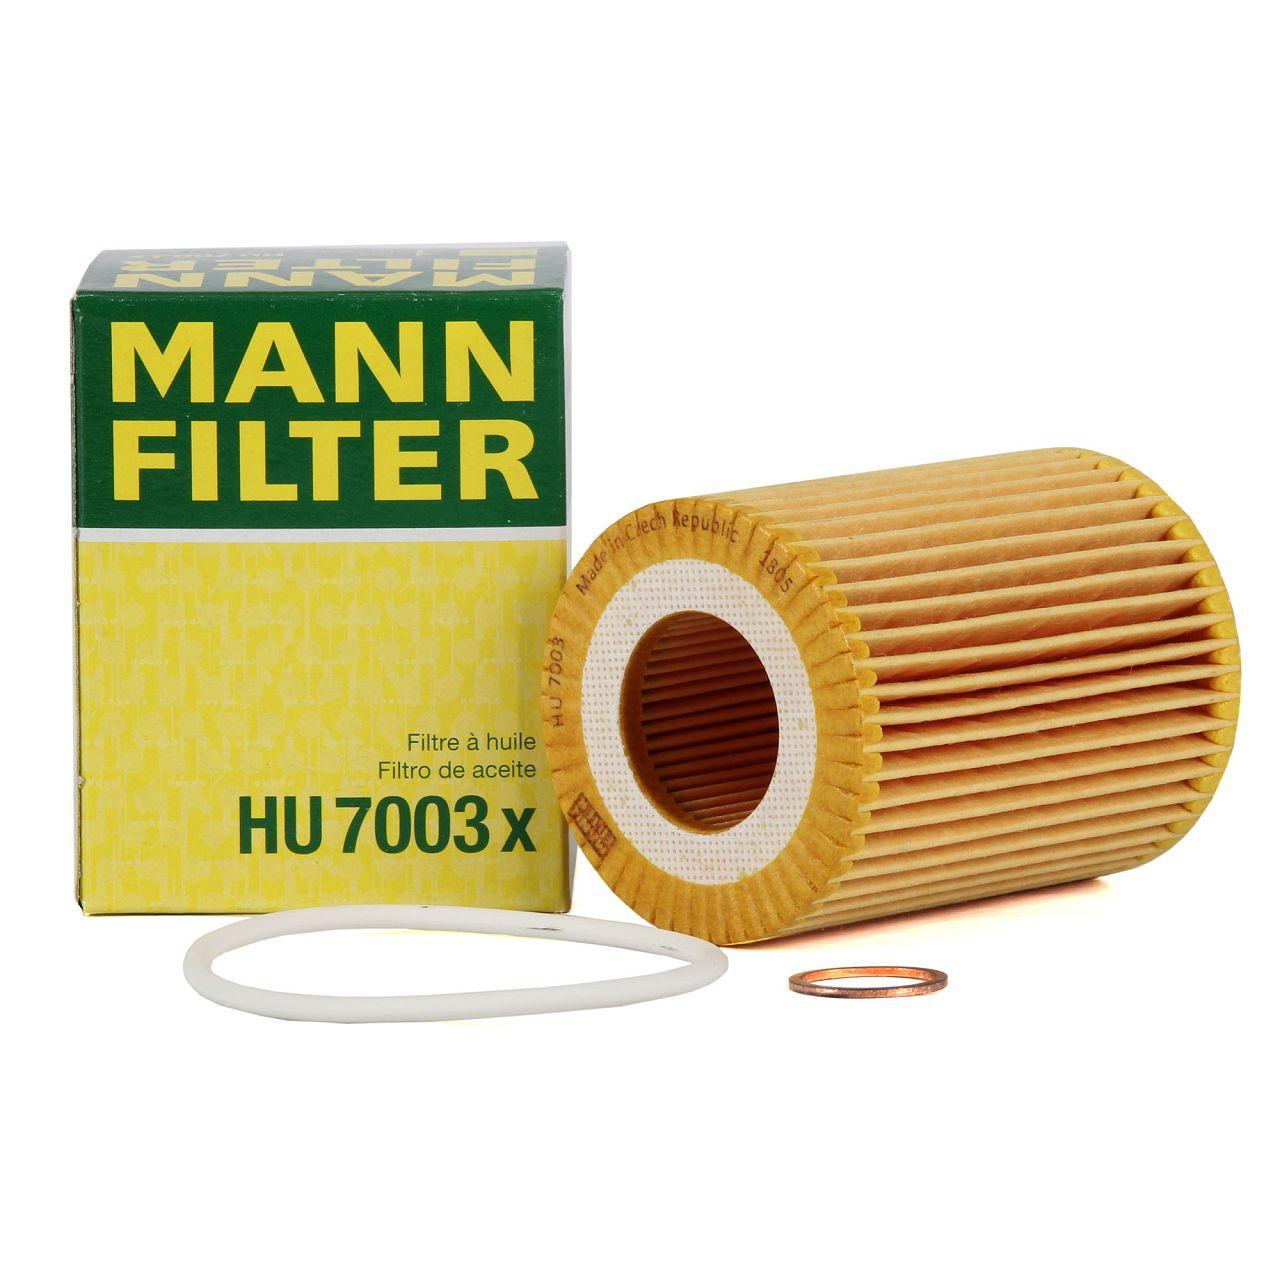 MANN HU7003x Ölfilter BMW 1er F20 F21 114-120i 3er F30 F31 316i 320i N13